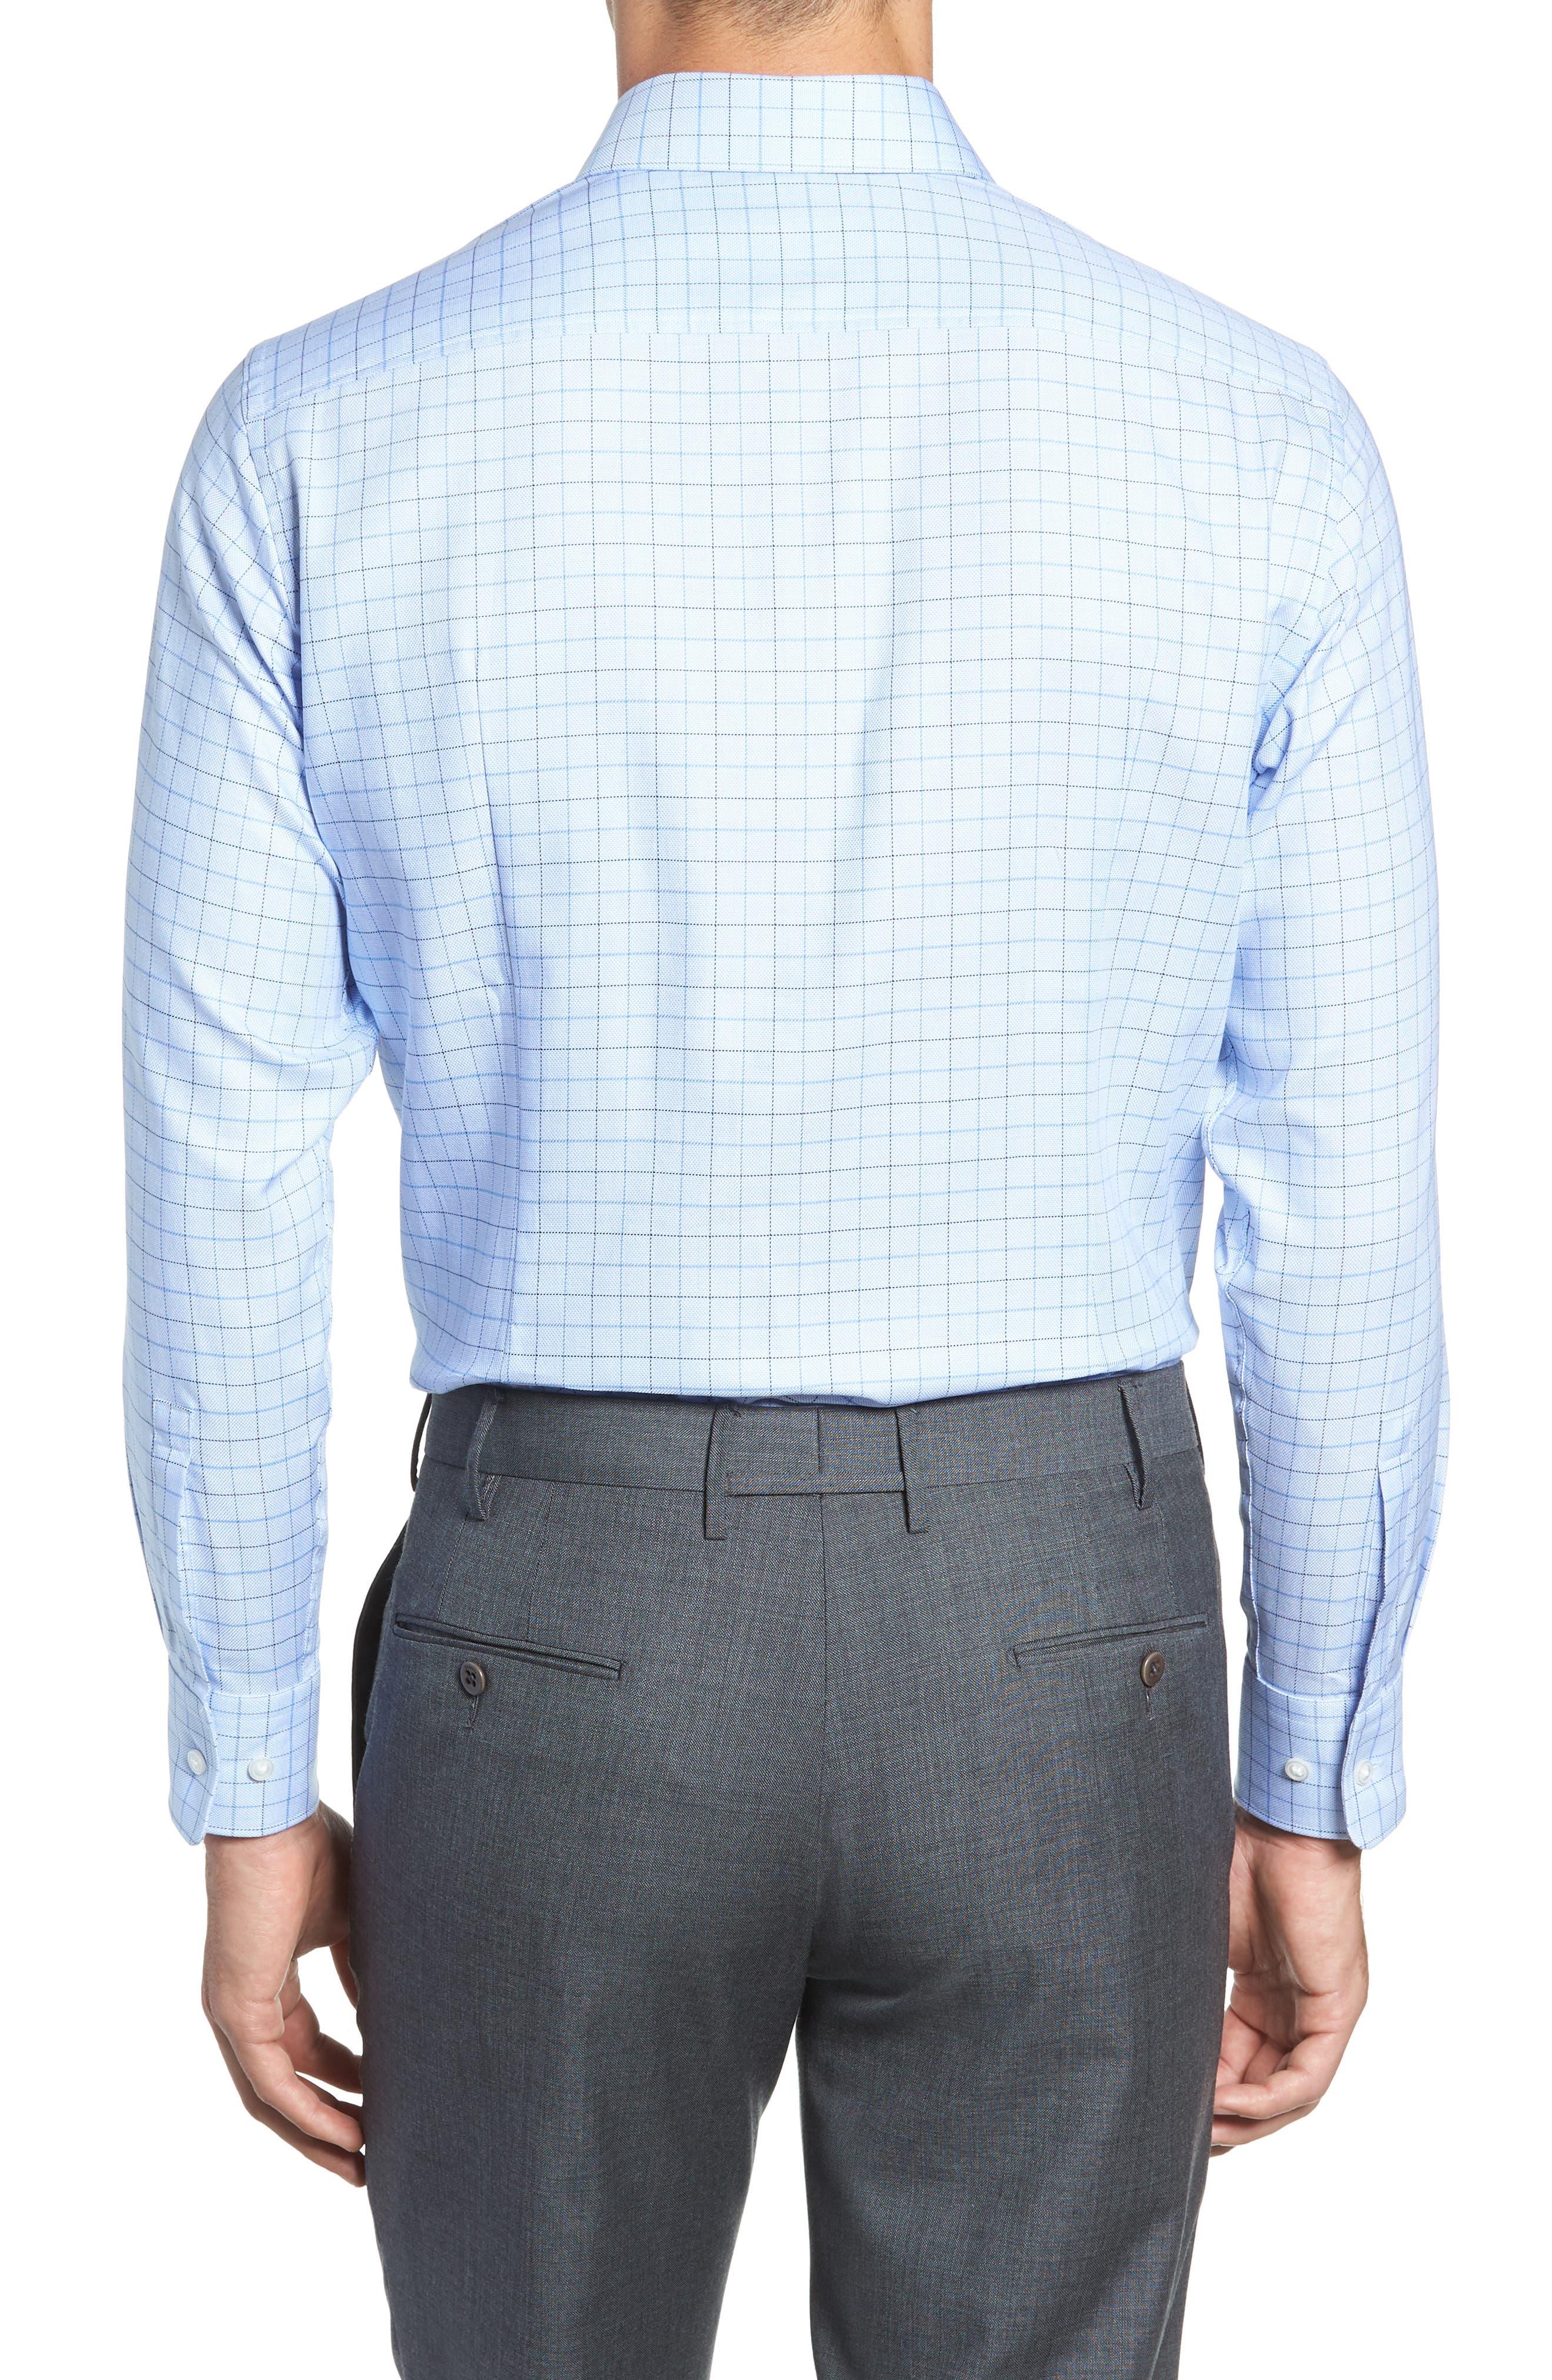 Mark Sharp Fit Check Dress Shirt,                             Alternate thumbnail 3, color,                             LIGHT BLUE